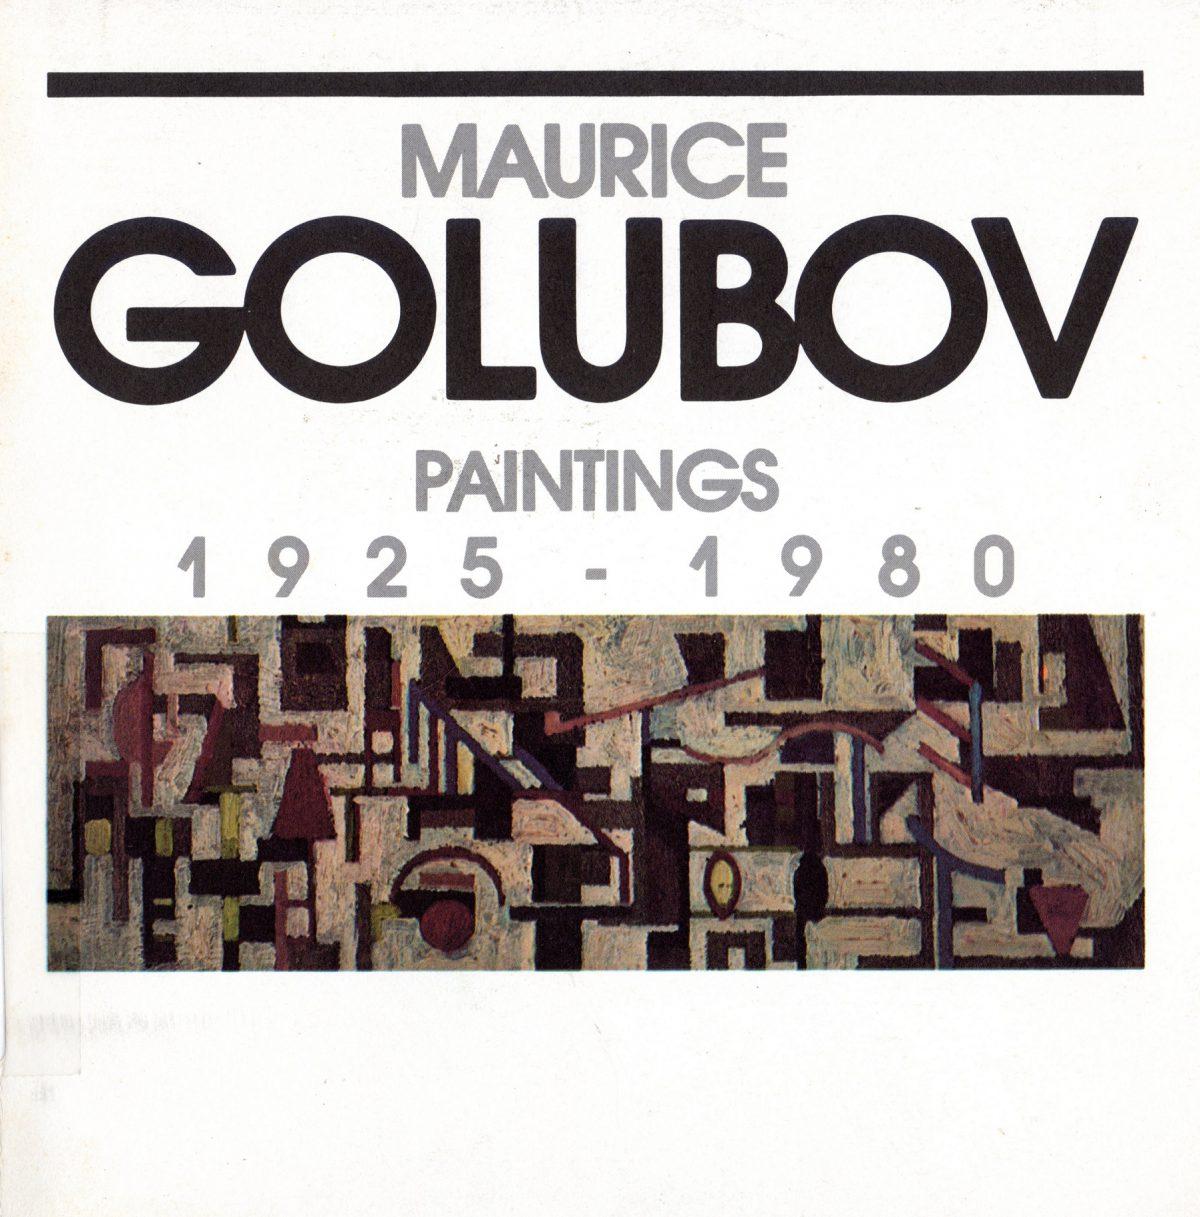 Maurice Golubov Paintings Catalog